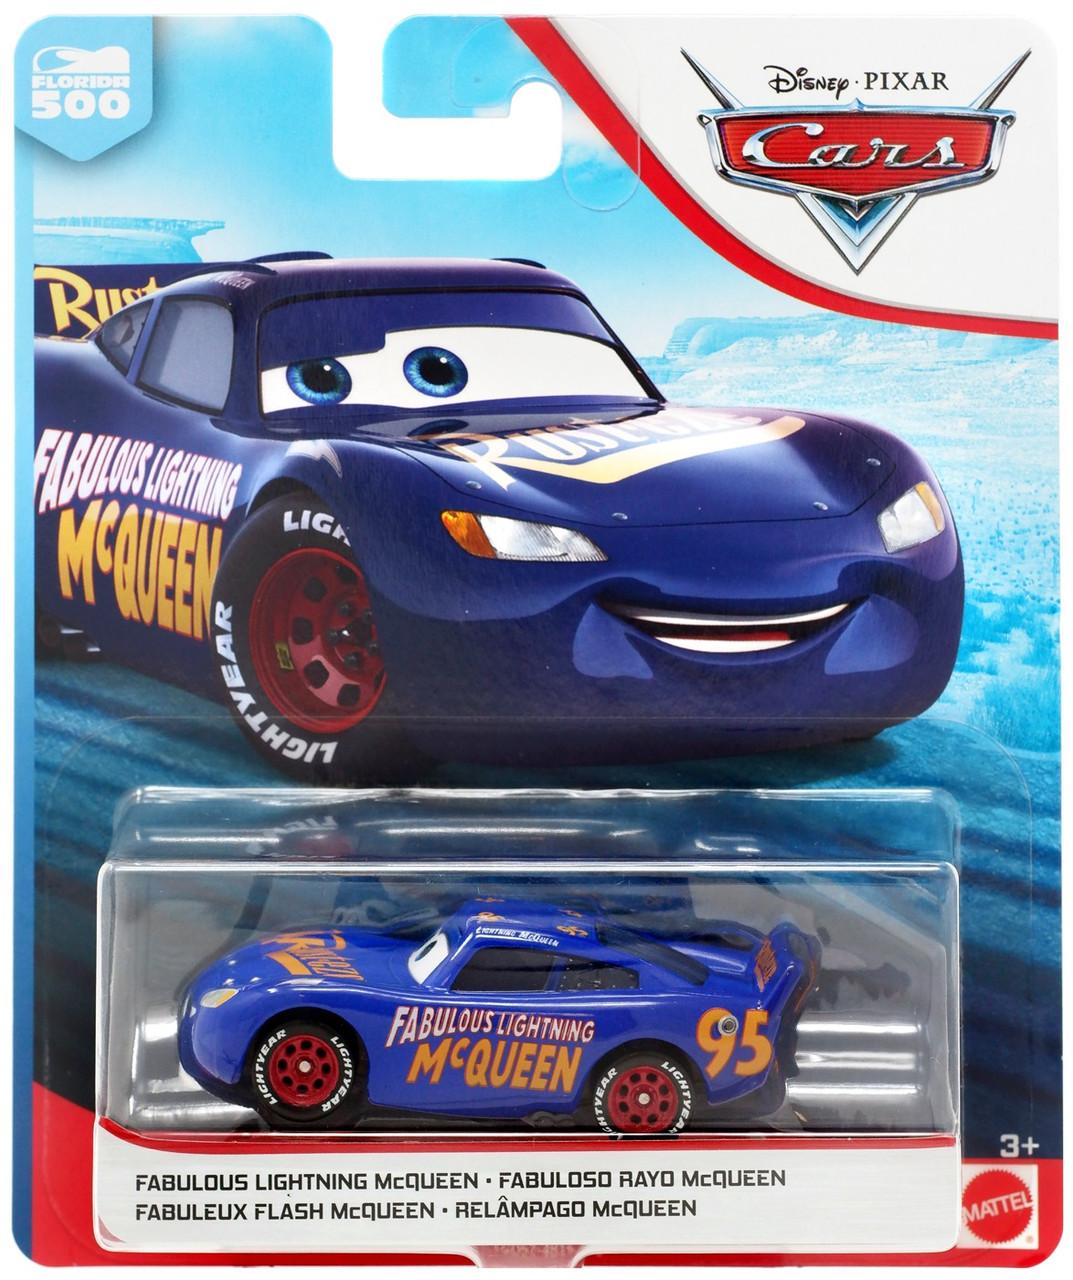 Disney Pixar Cars Cars 3 Florida 500 Fabulous Lightning Mcqueen